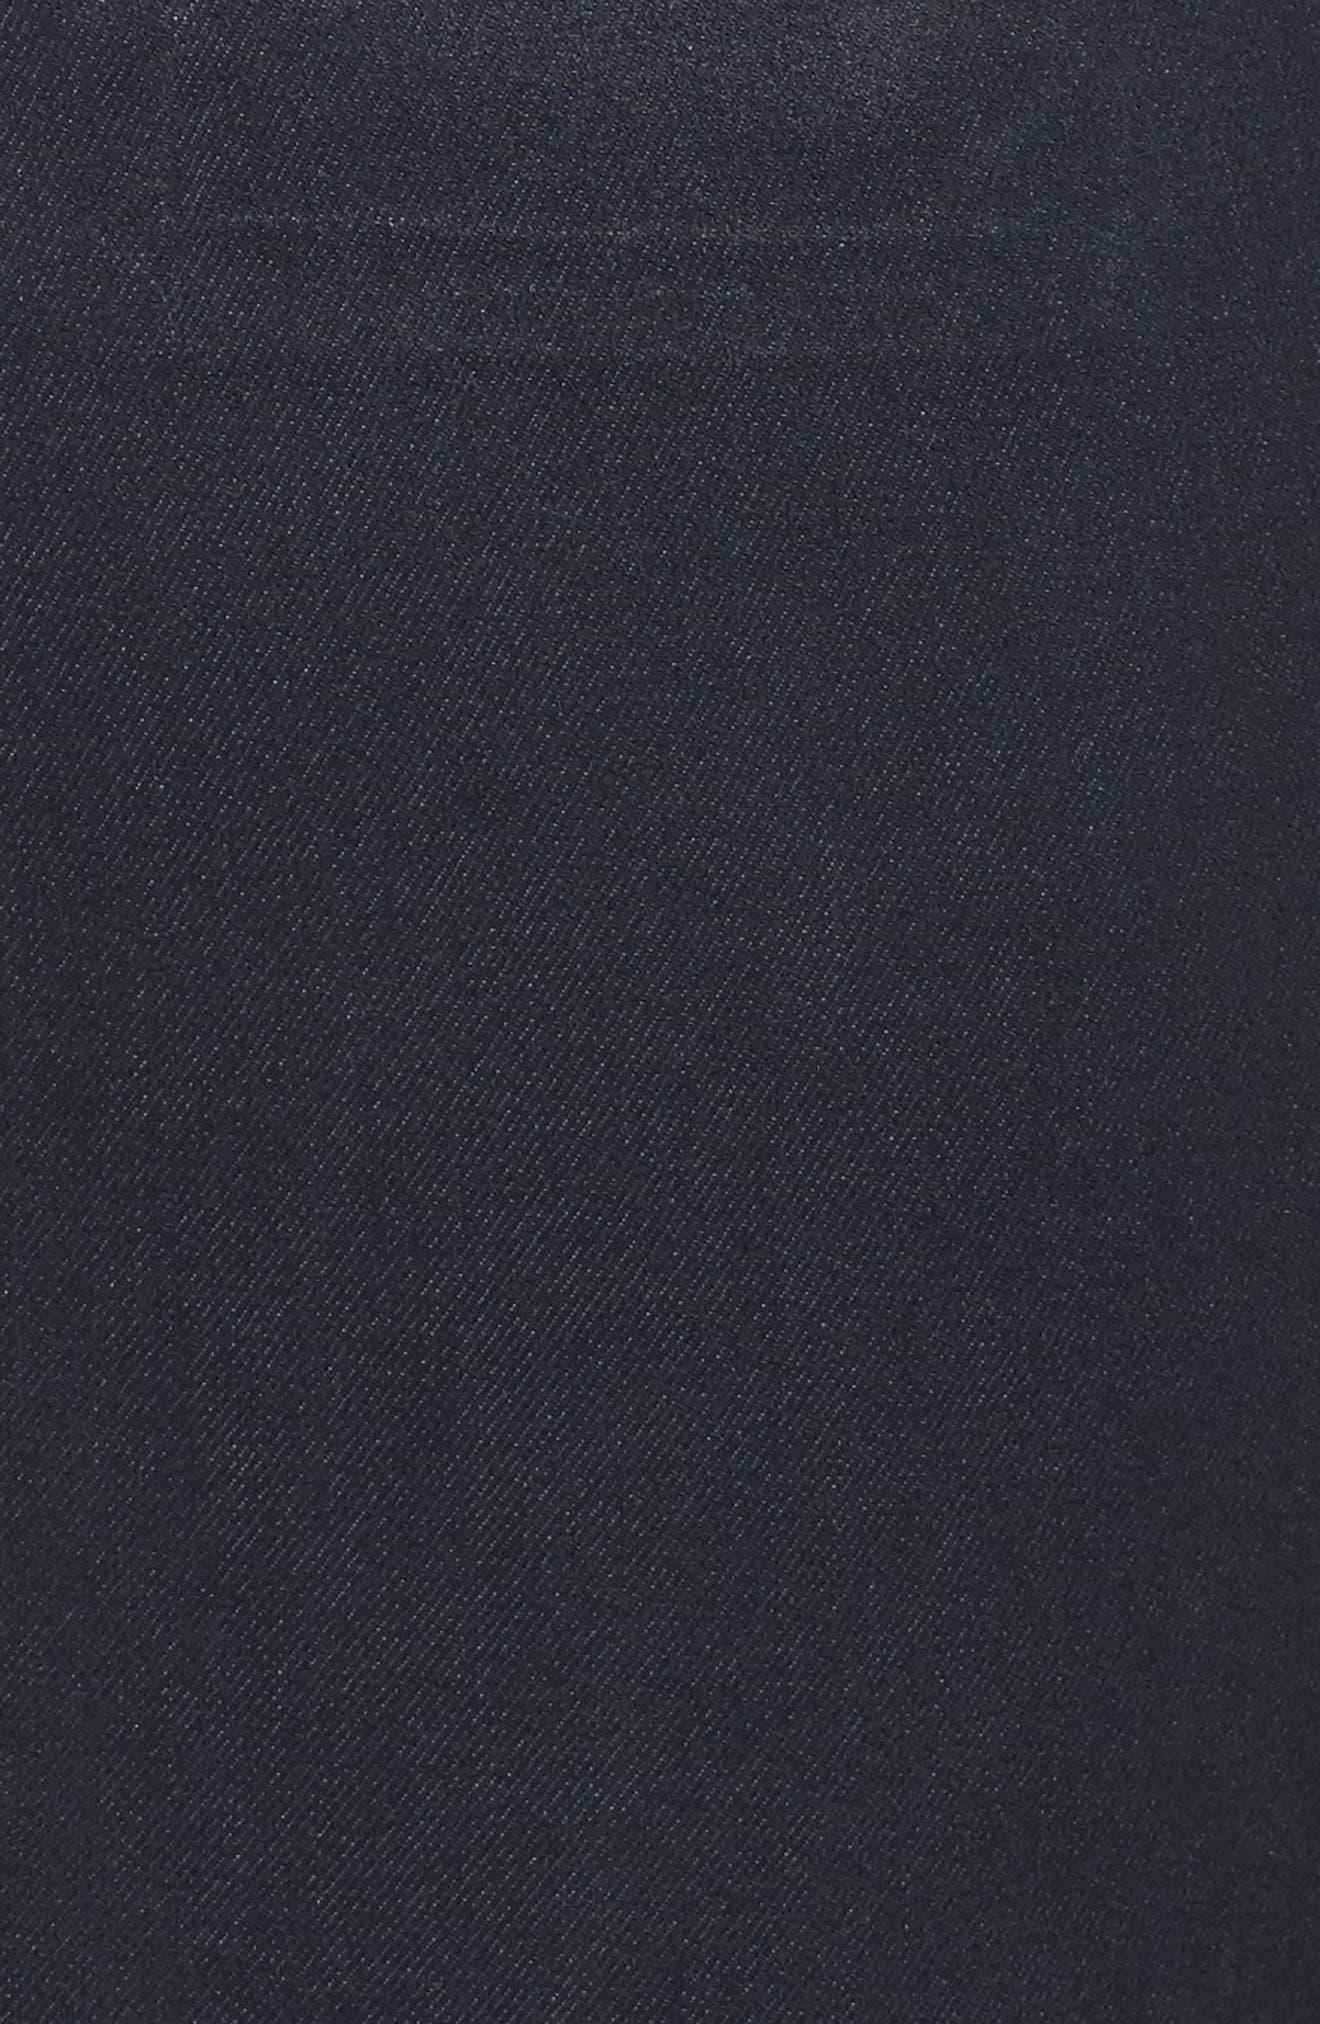 Mia Toothpick Jeans,                             Alternate thumbnail 5, color,                             Navy